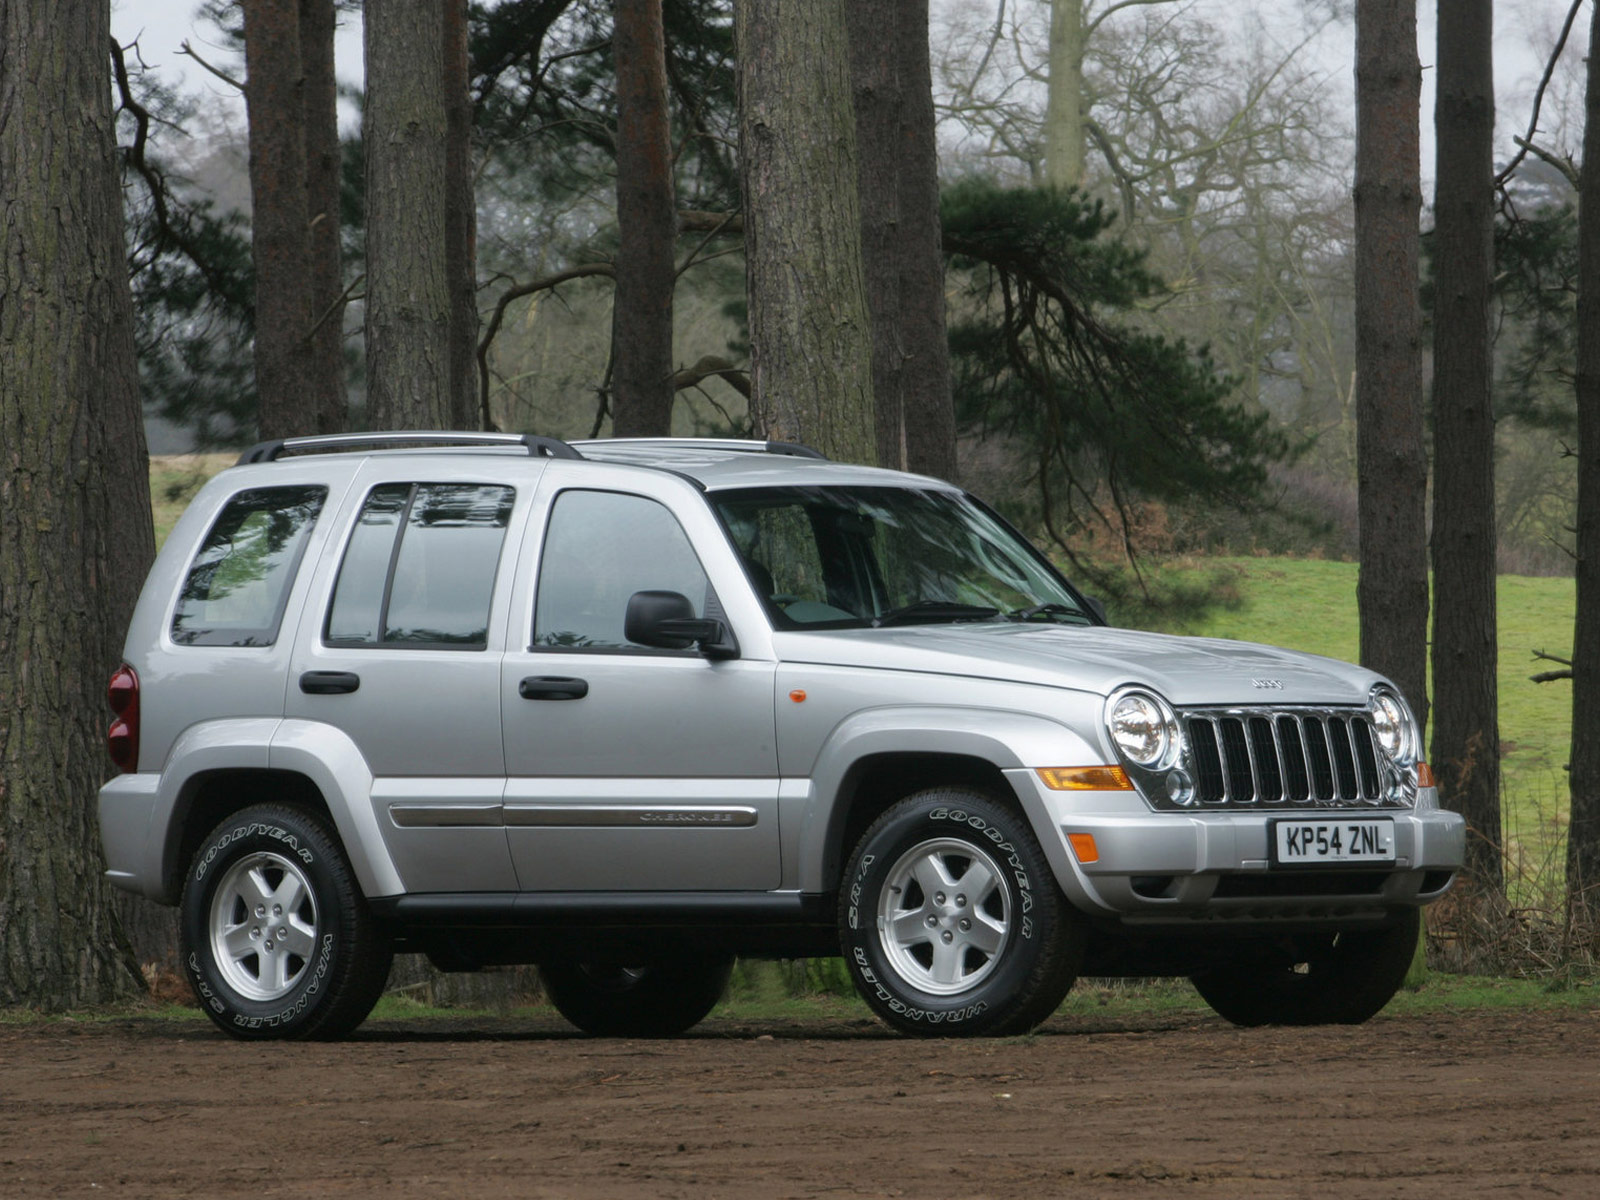 2005 JEEP Cherokee UK Version Pictures